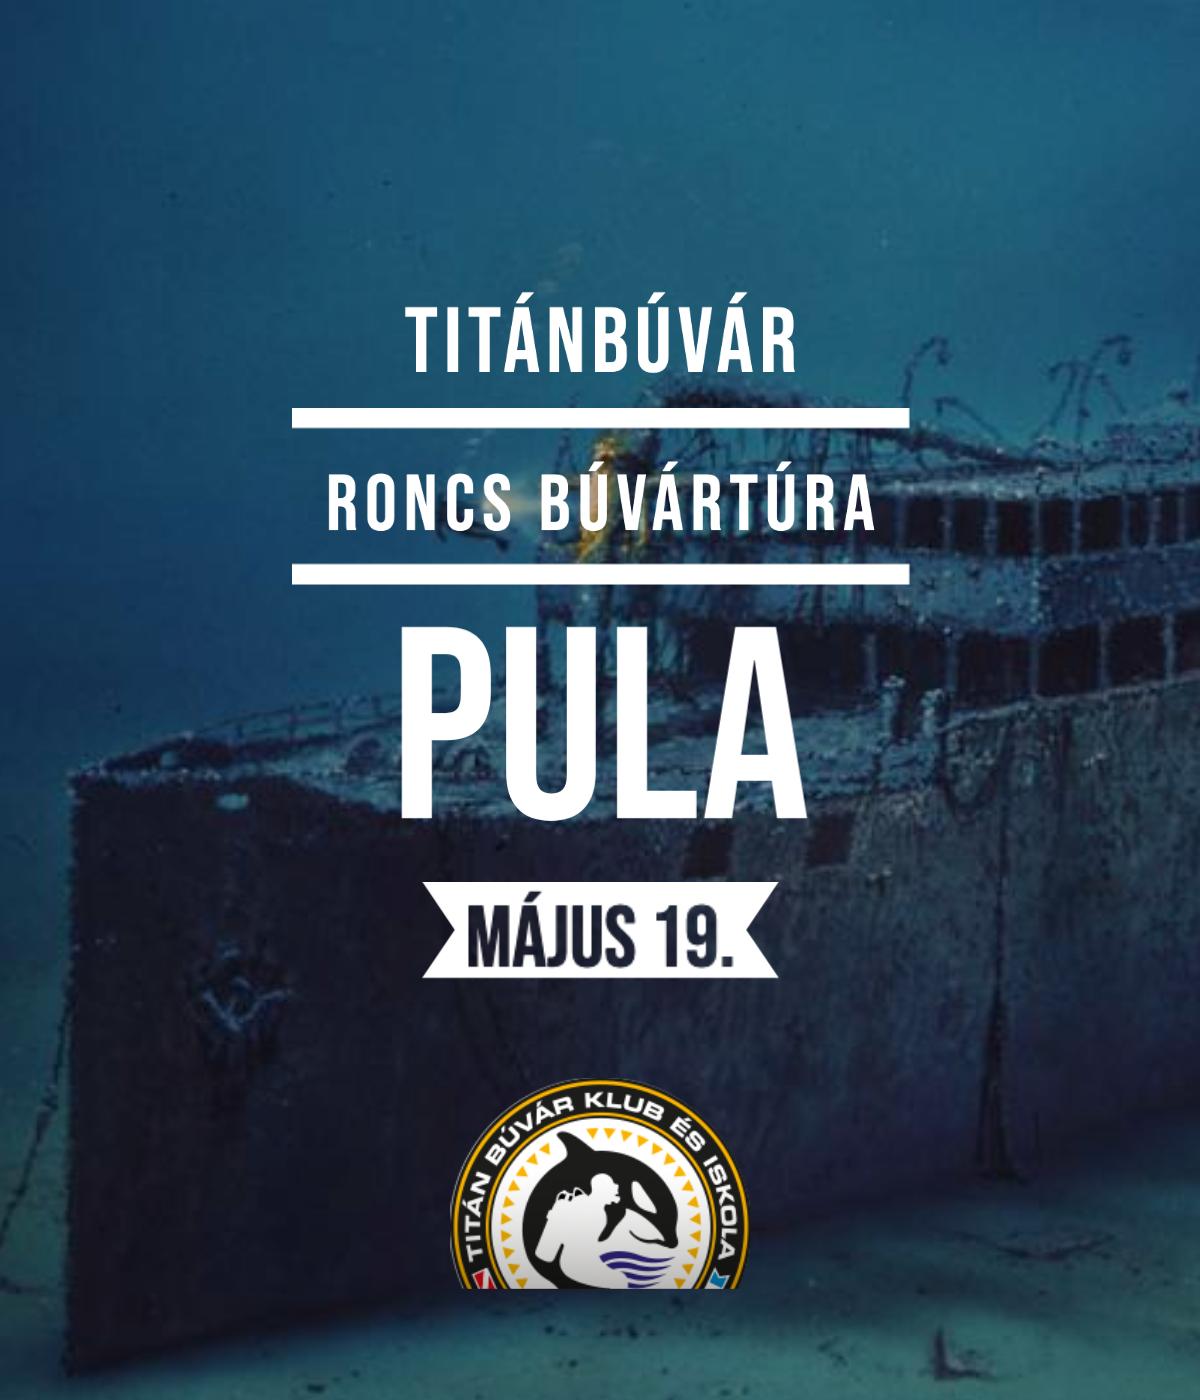 pula-roncs-buvarszafari-titanbuvar-adria-horbatorszag-buvar-buvarkodas-utazas